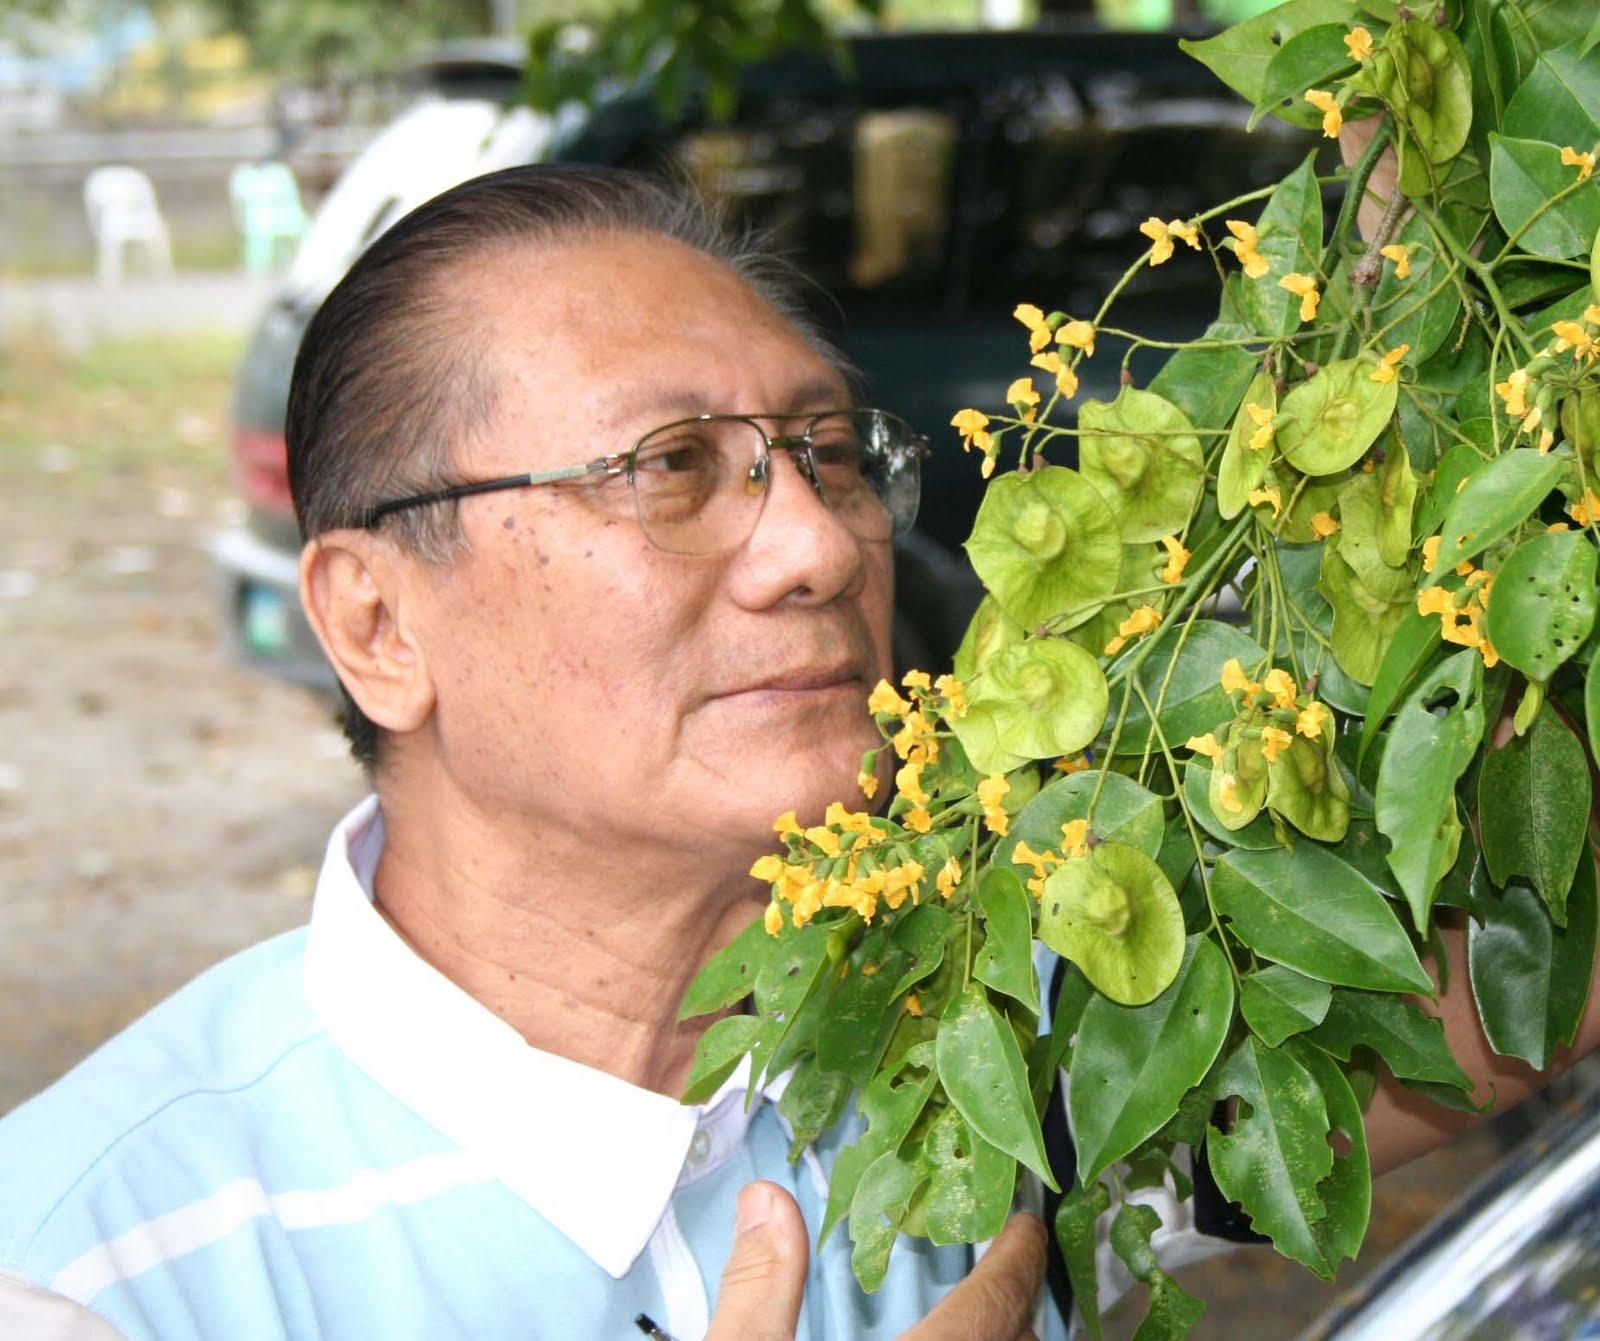 use eucalyptus for sore throat